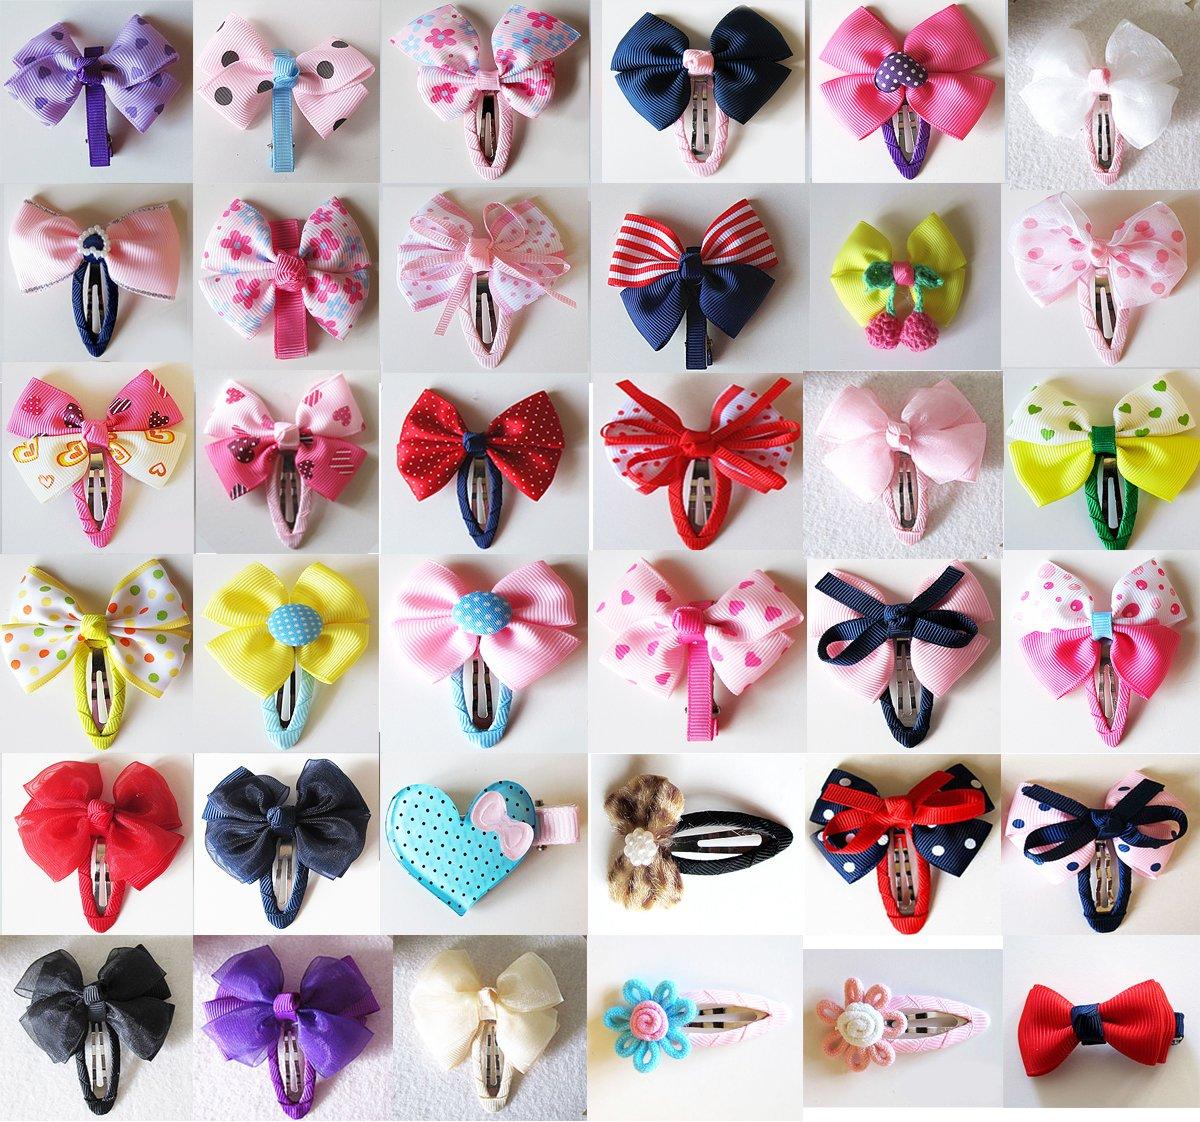 18 Pairs Girls Baby Kids Children Hair Accessories Bows Animal Clips Slides